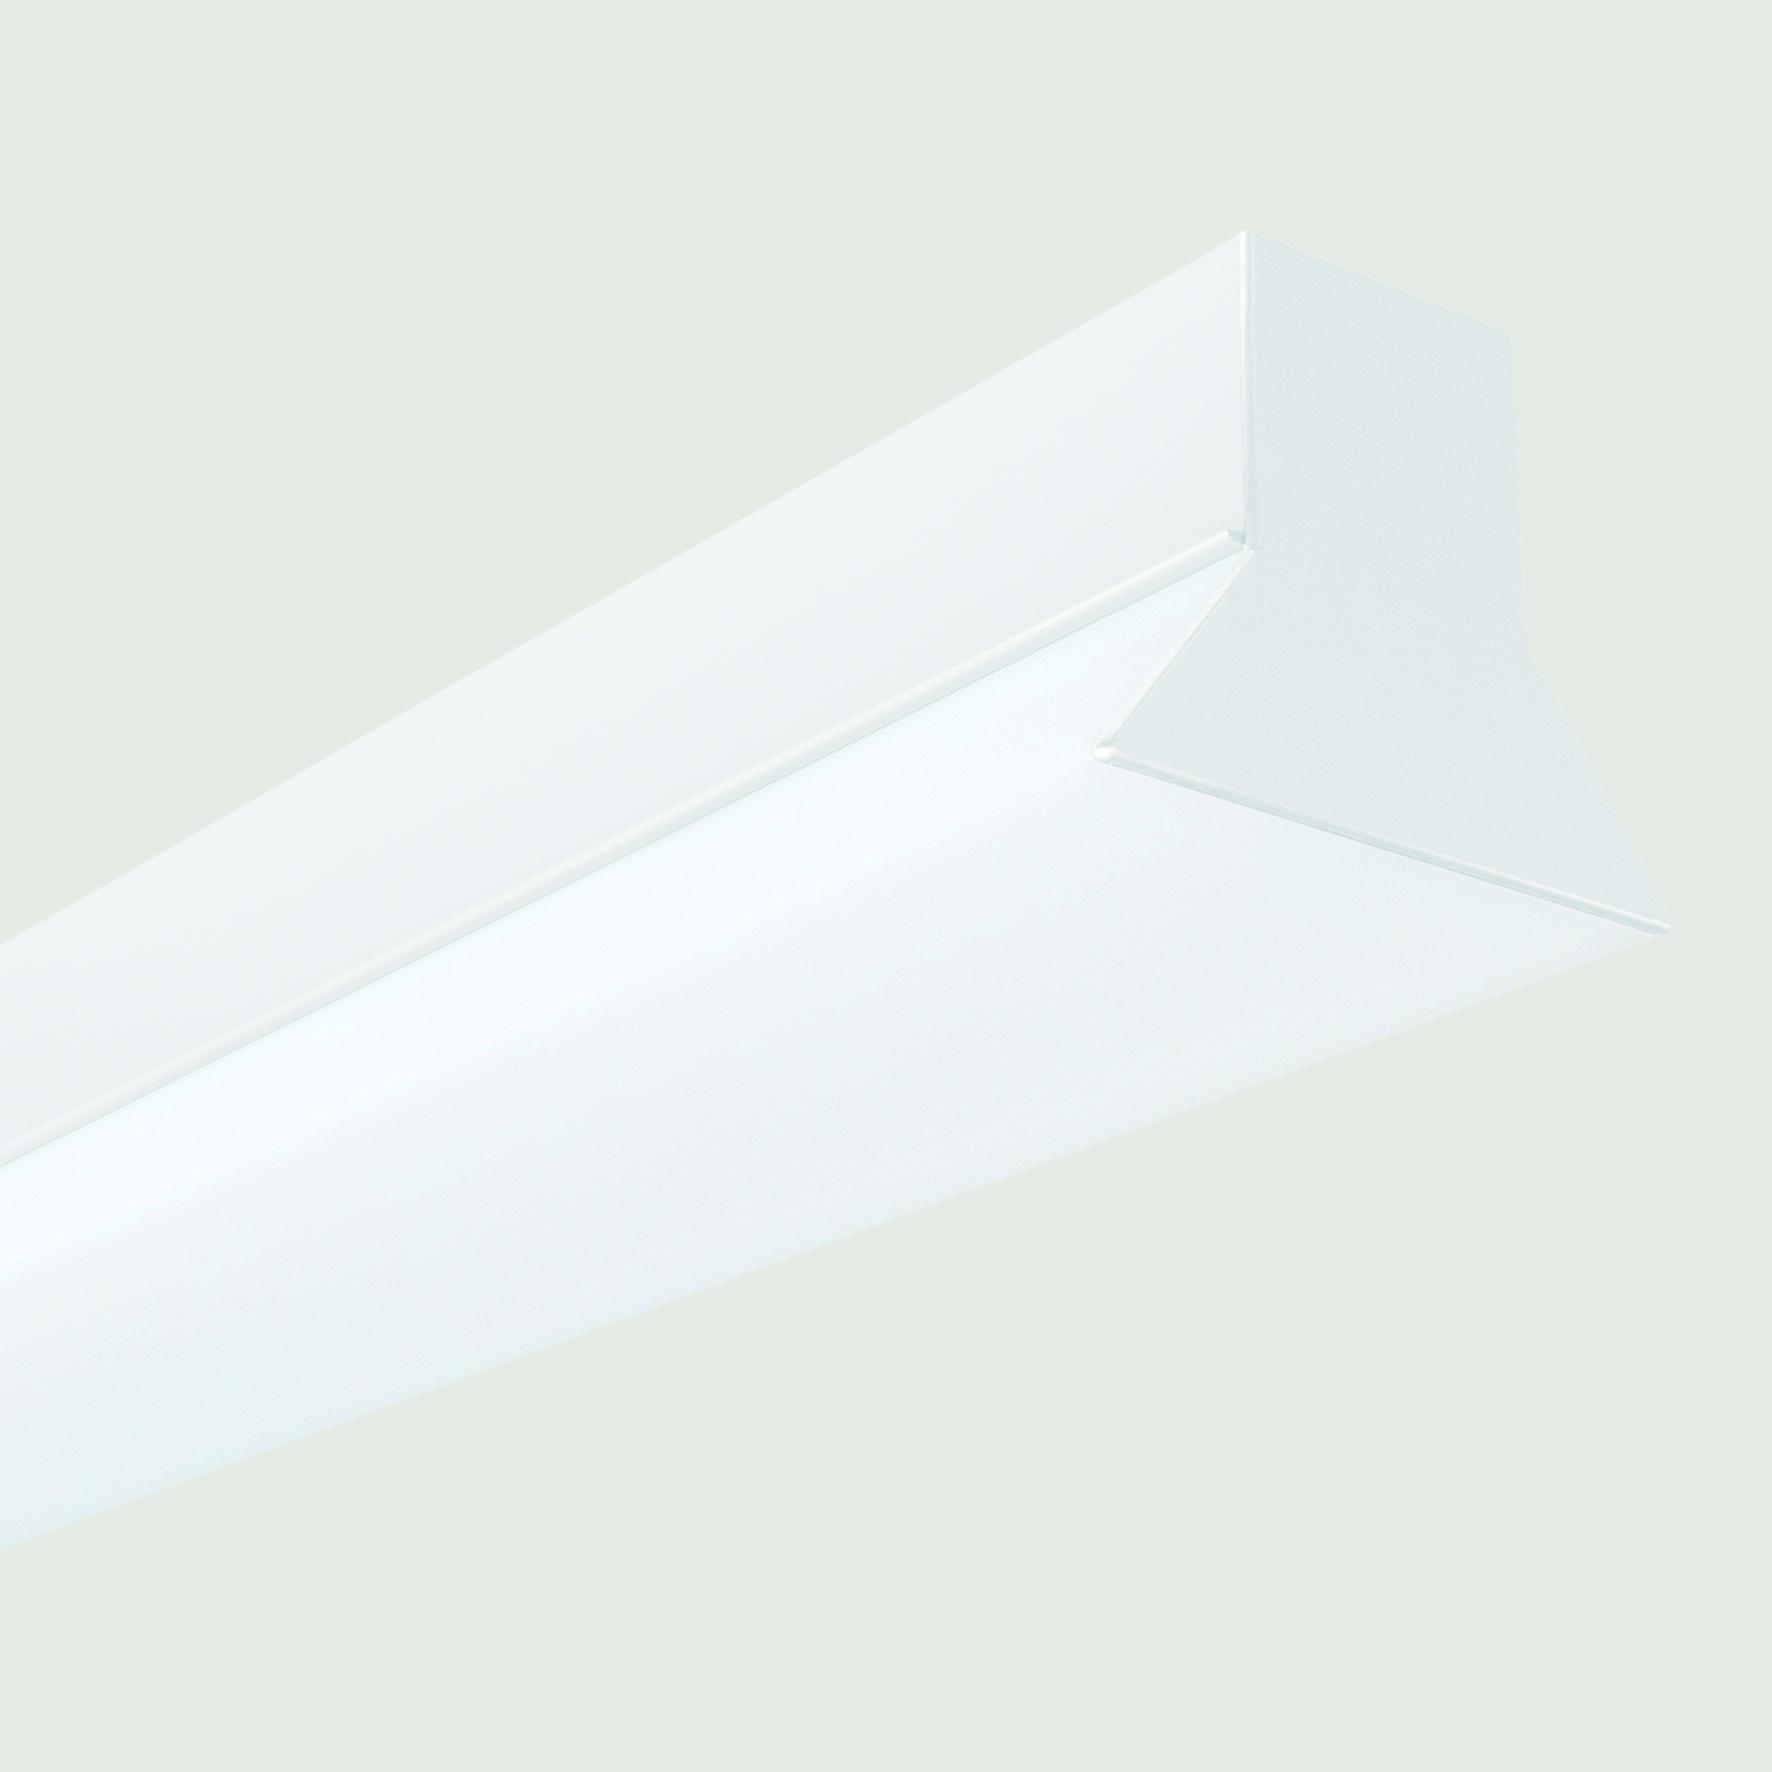 SE40T-profilleuchte-weiß-sml-led